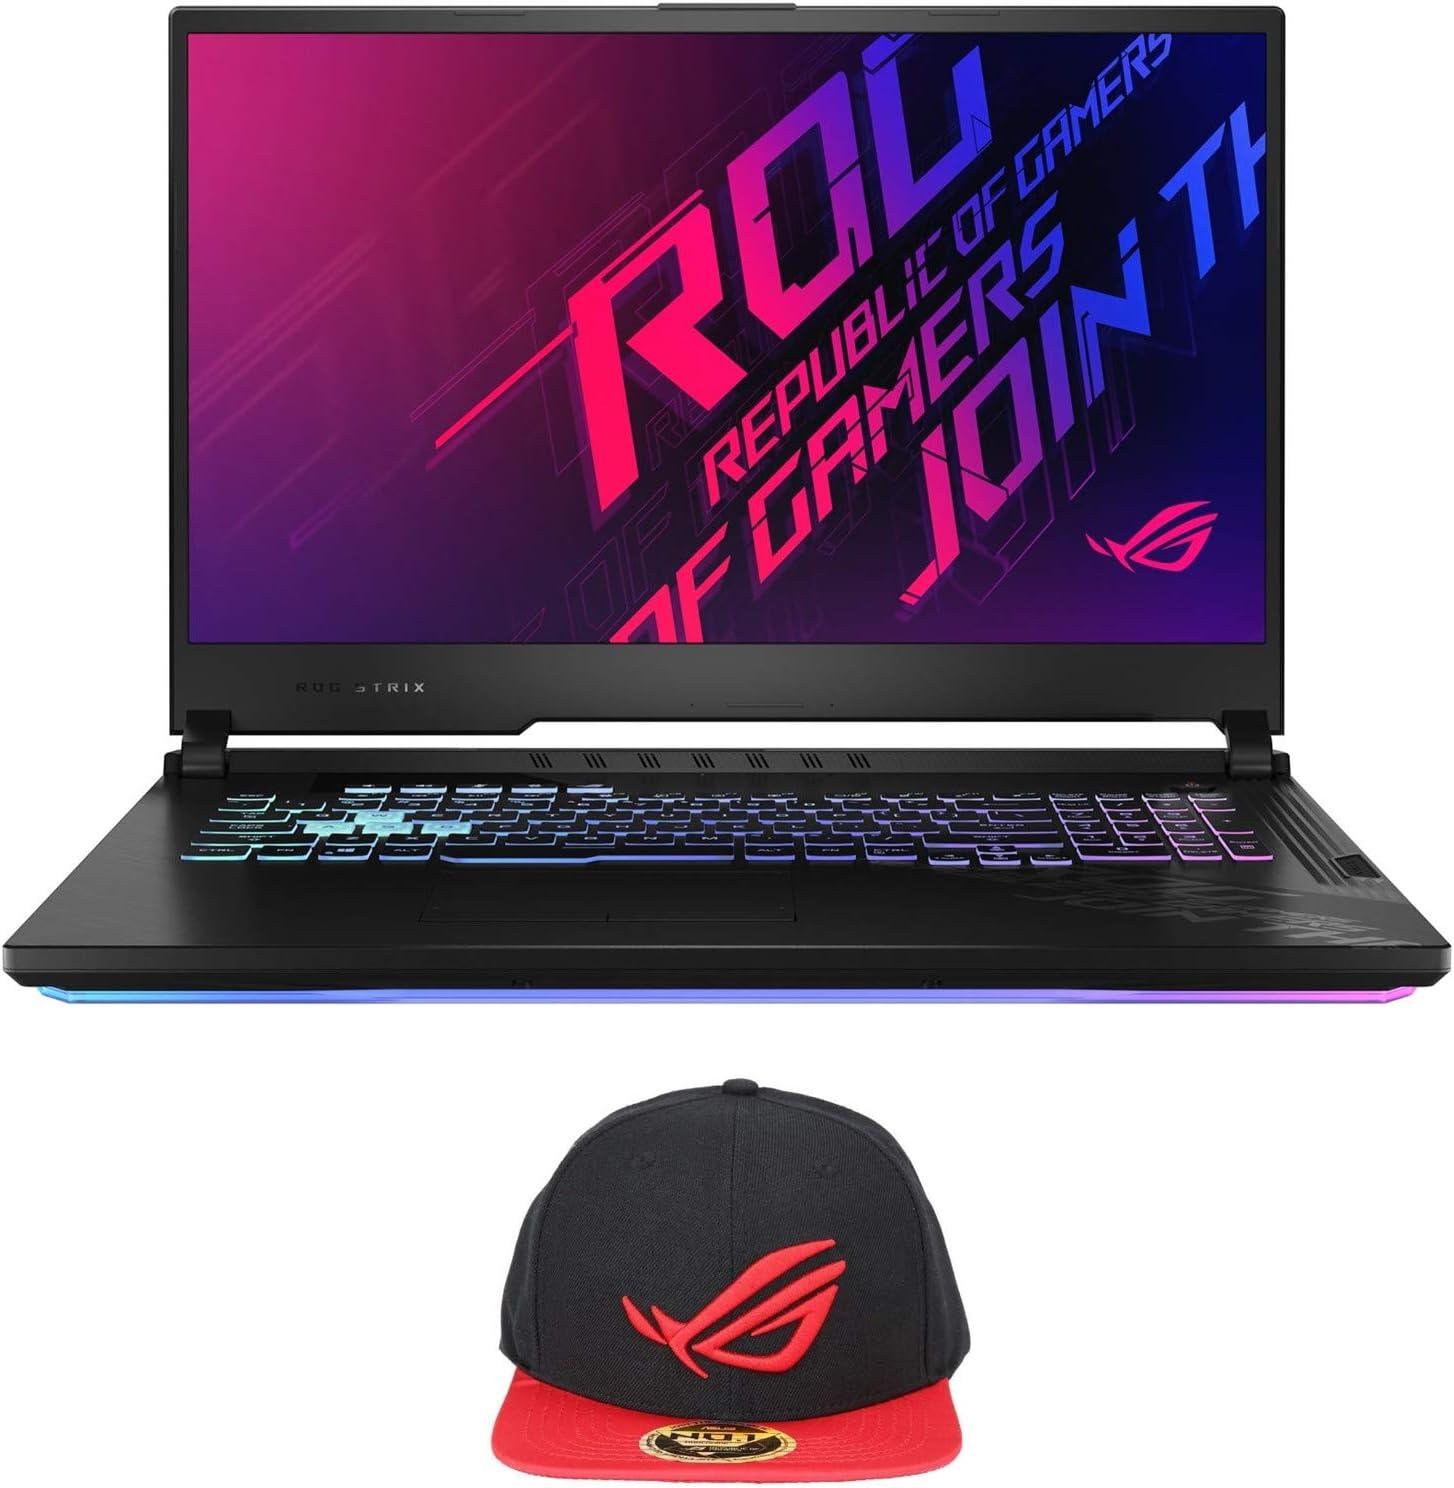 "ASUS ROG Strix G17 G712LU-RS73 Enthusiast (i7-10750H, 32GB RAM, 1TB NVMe SSD, GTX 1660Ti 6GB, 17.3"" FHD 120Hz, Windows 10) Gaming Notebook"